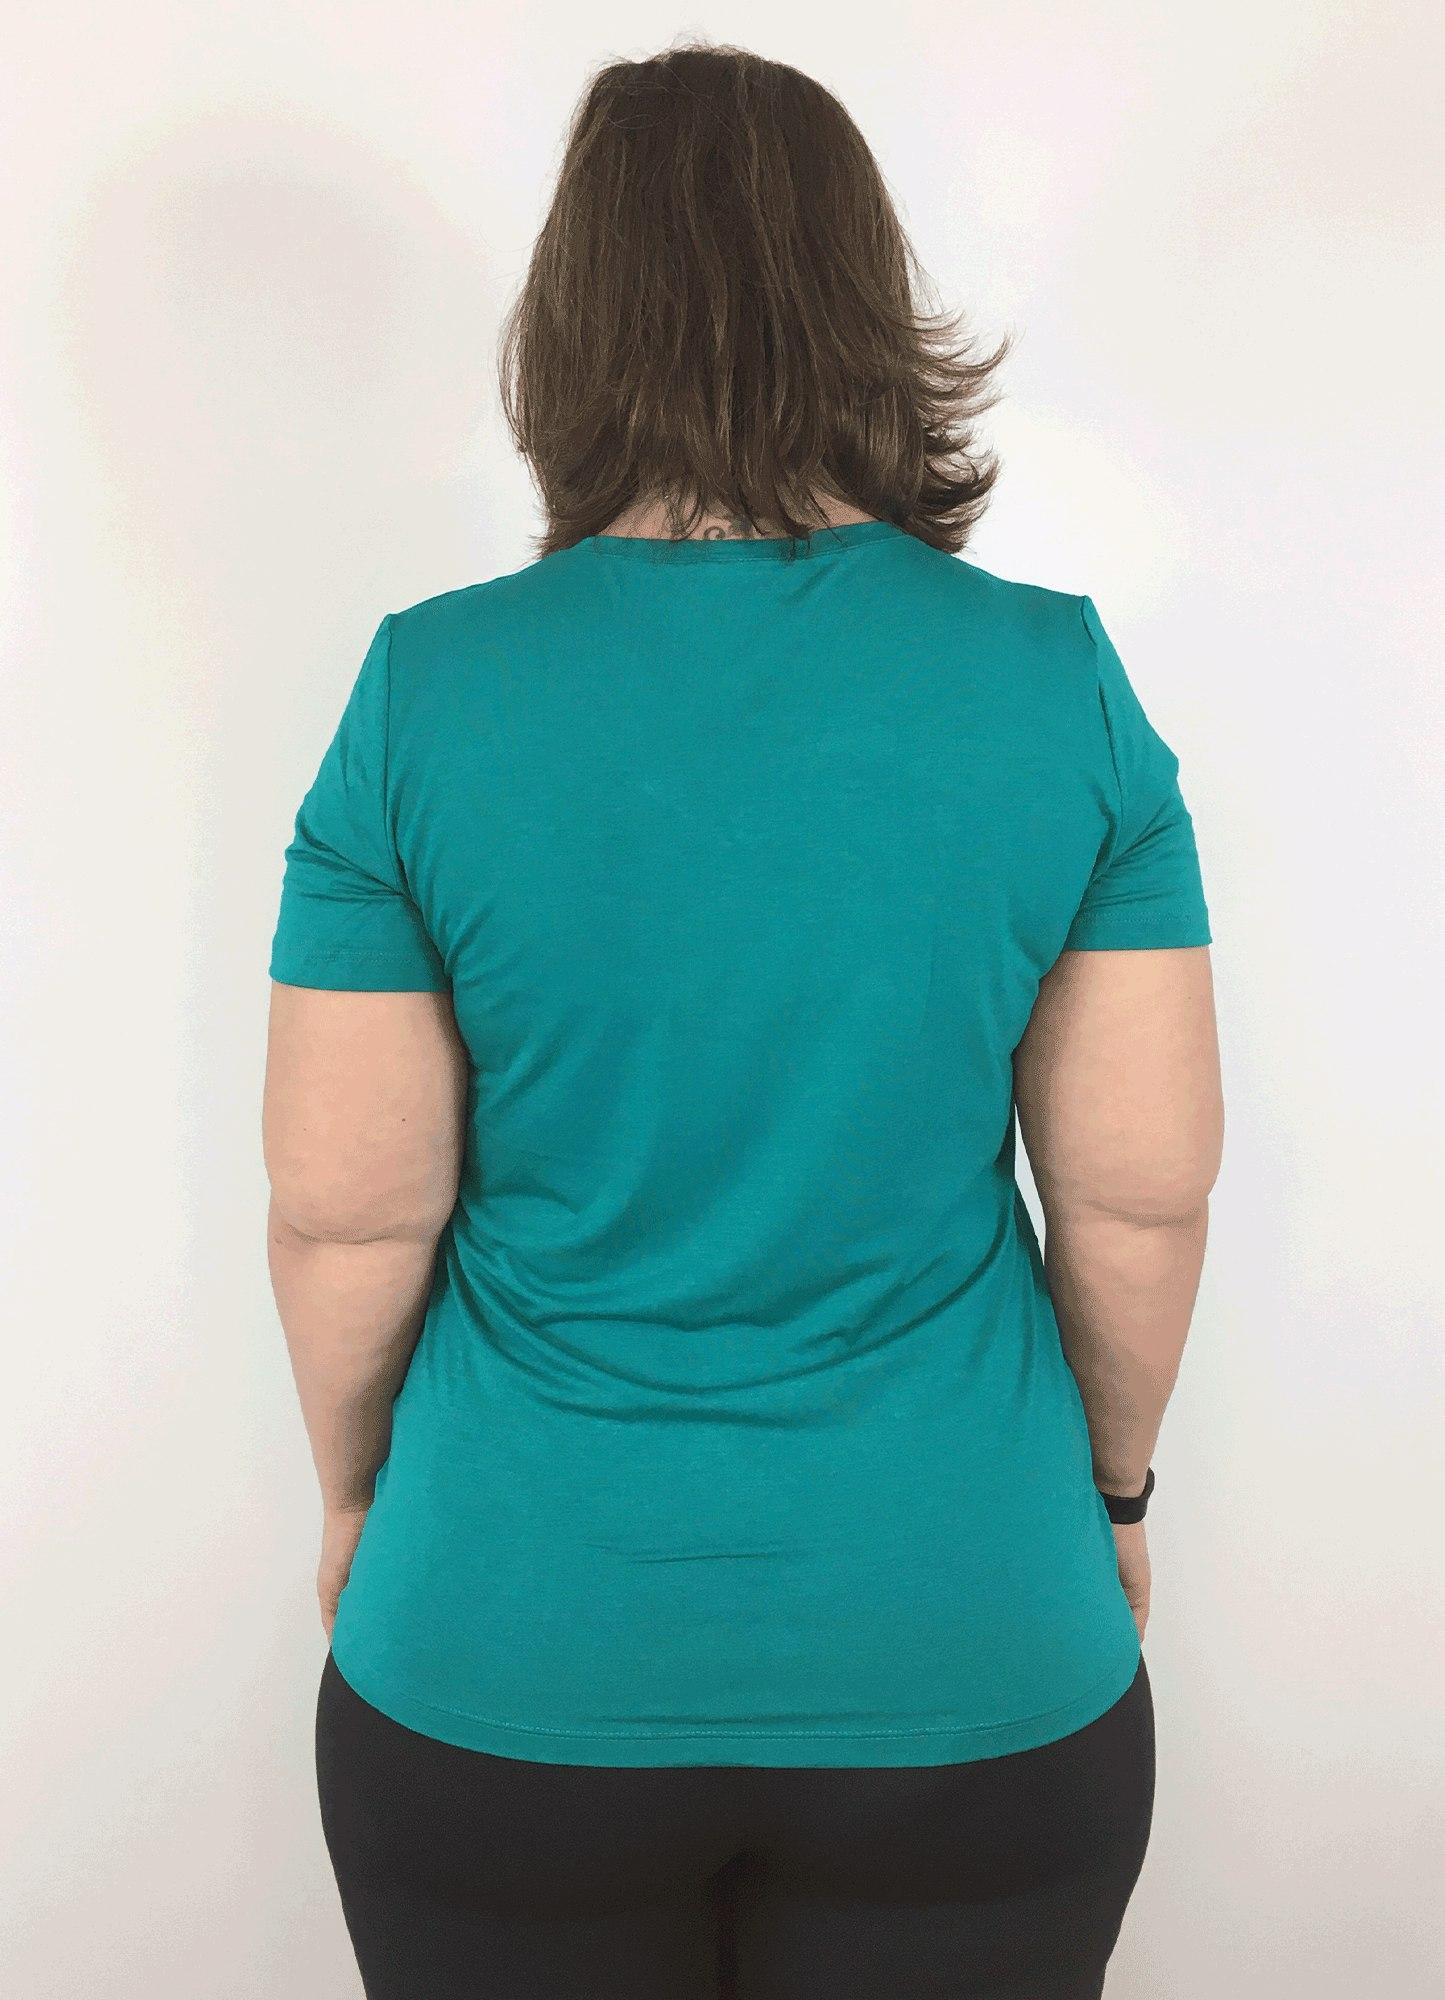 Blusa Feminina Plus Size Básica Verde Jade Decote V Manga Curta